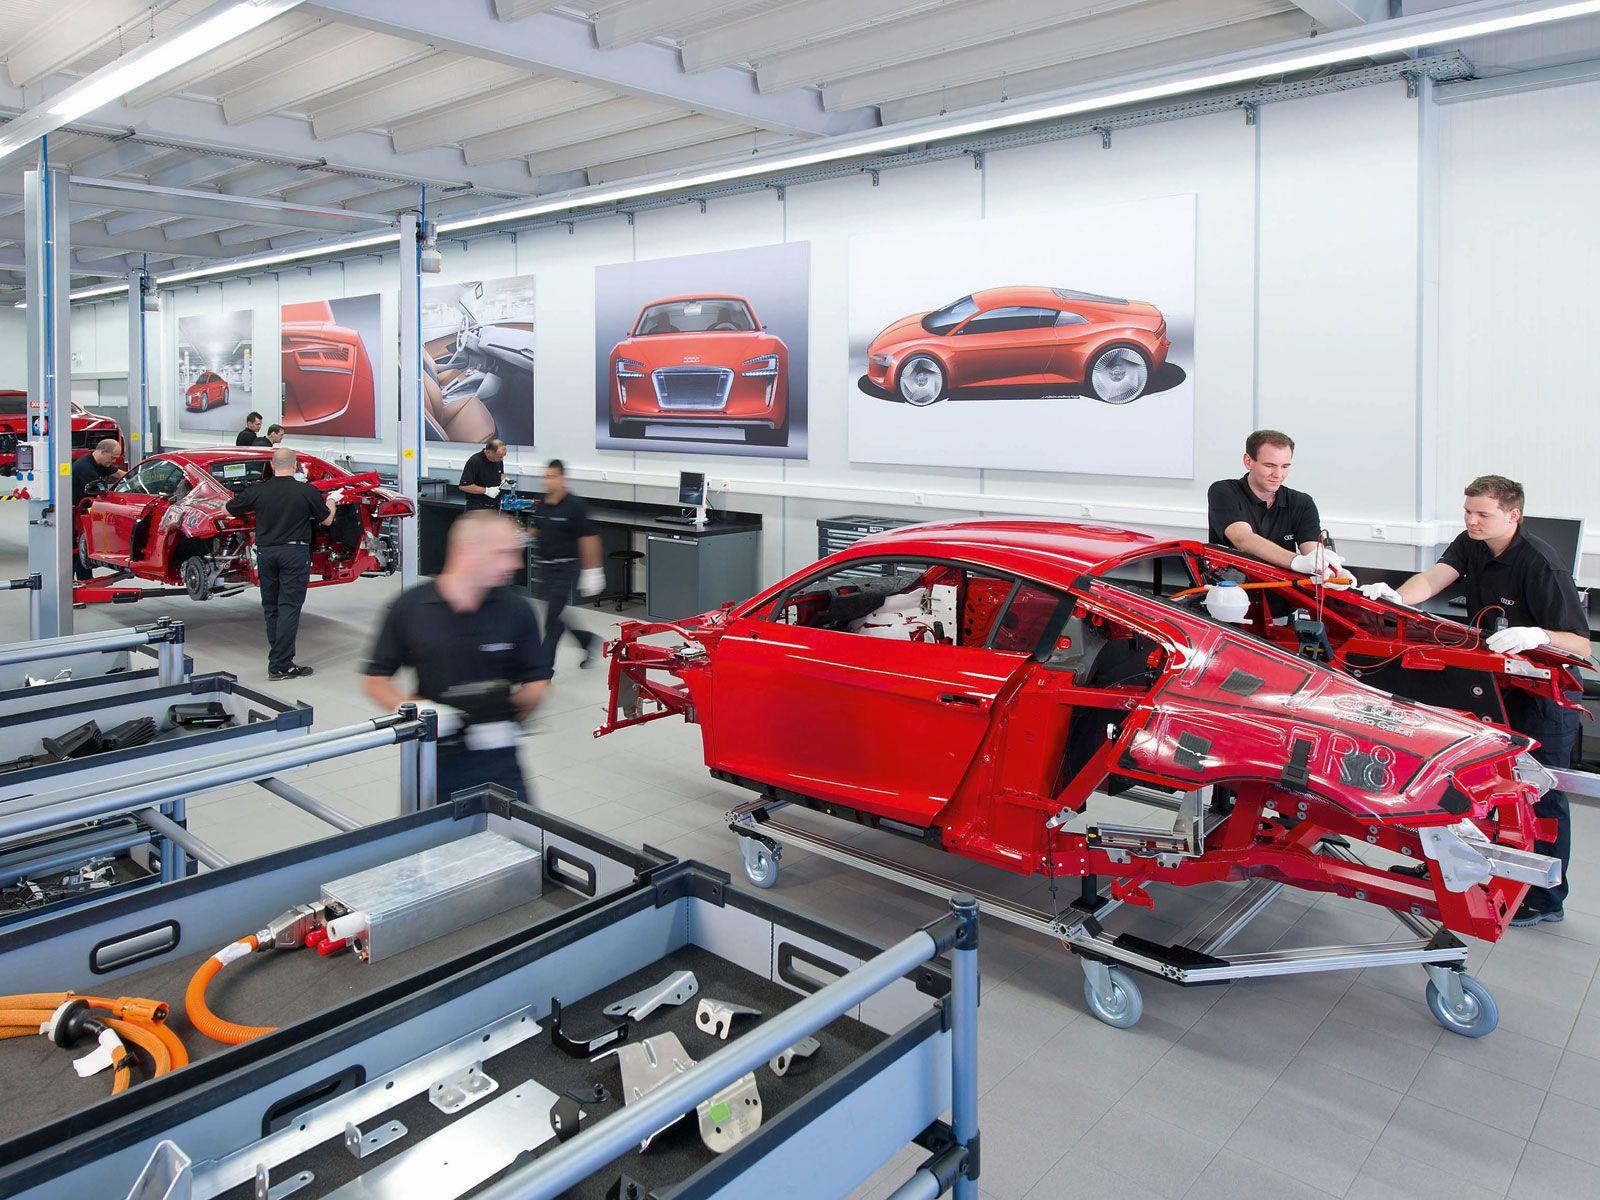 epcp-1105-04-o+audi-r8-e-tron-development-workshop+r8-chassis